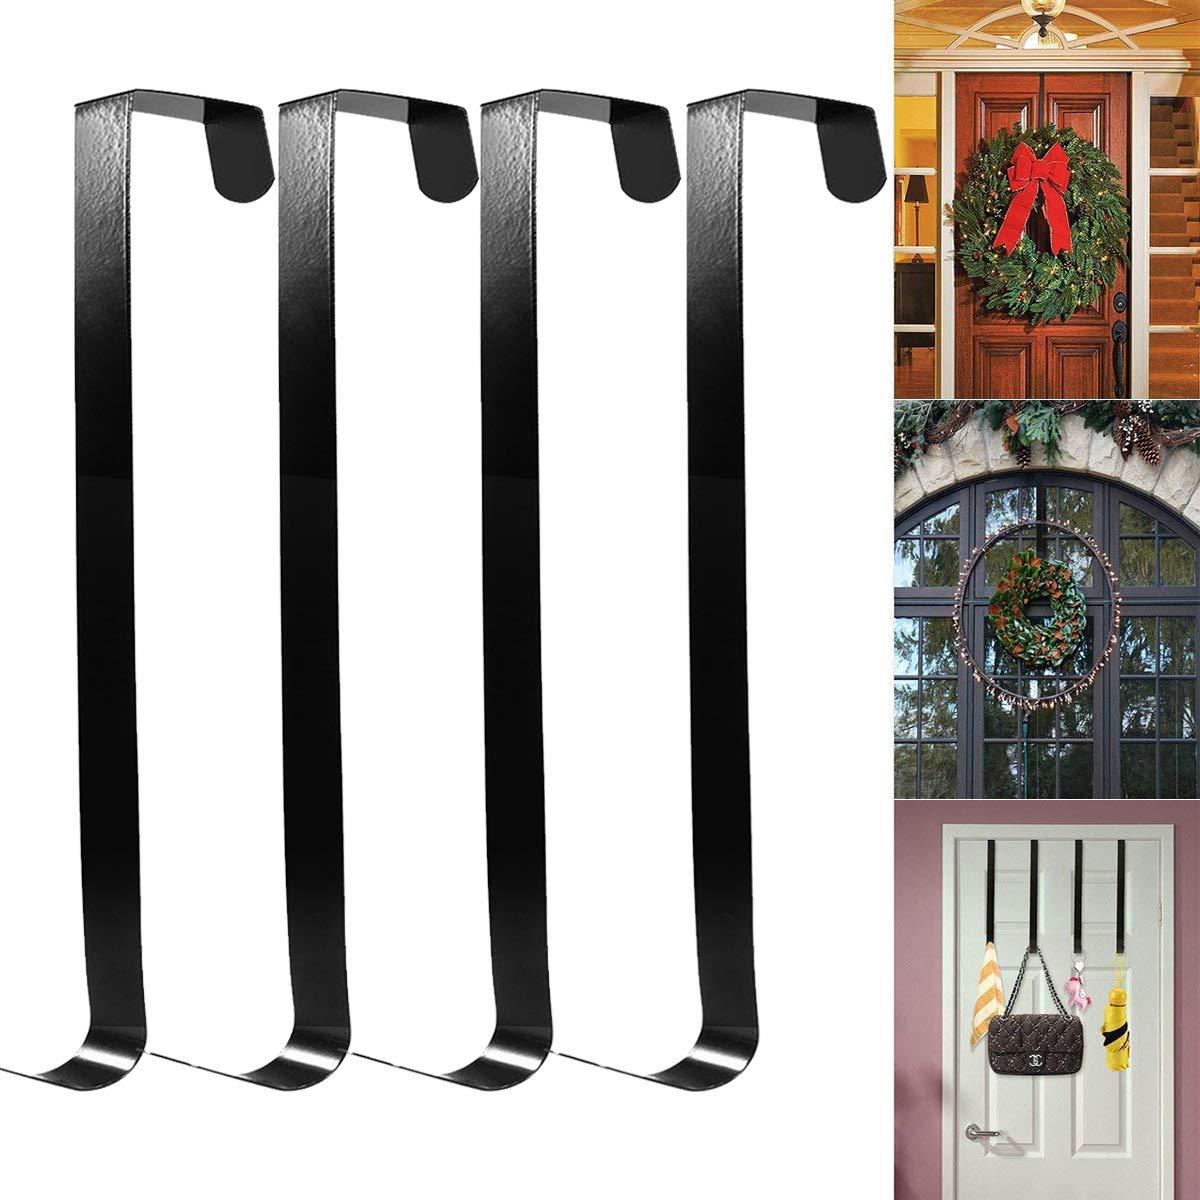 HOMEMAXS All Purpose Metal Wreath Hanger Over The Door Wreath Holder 13.8inch 4 Packs Black Large